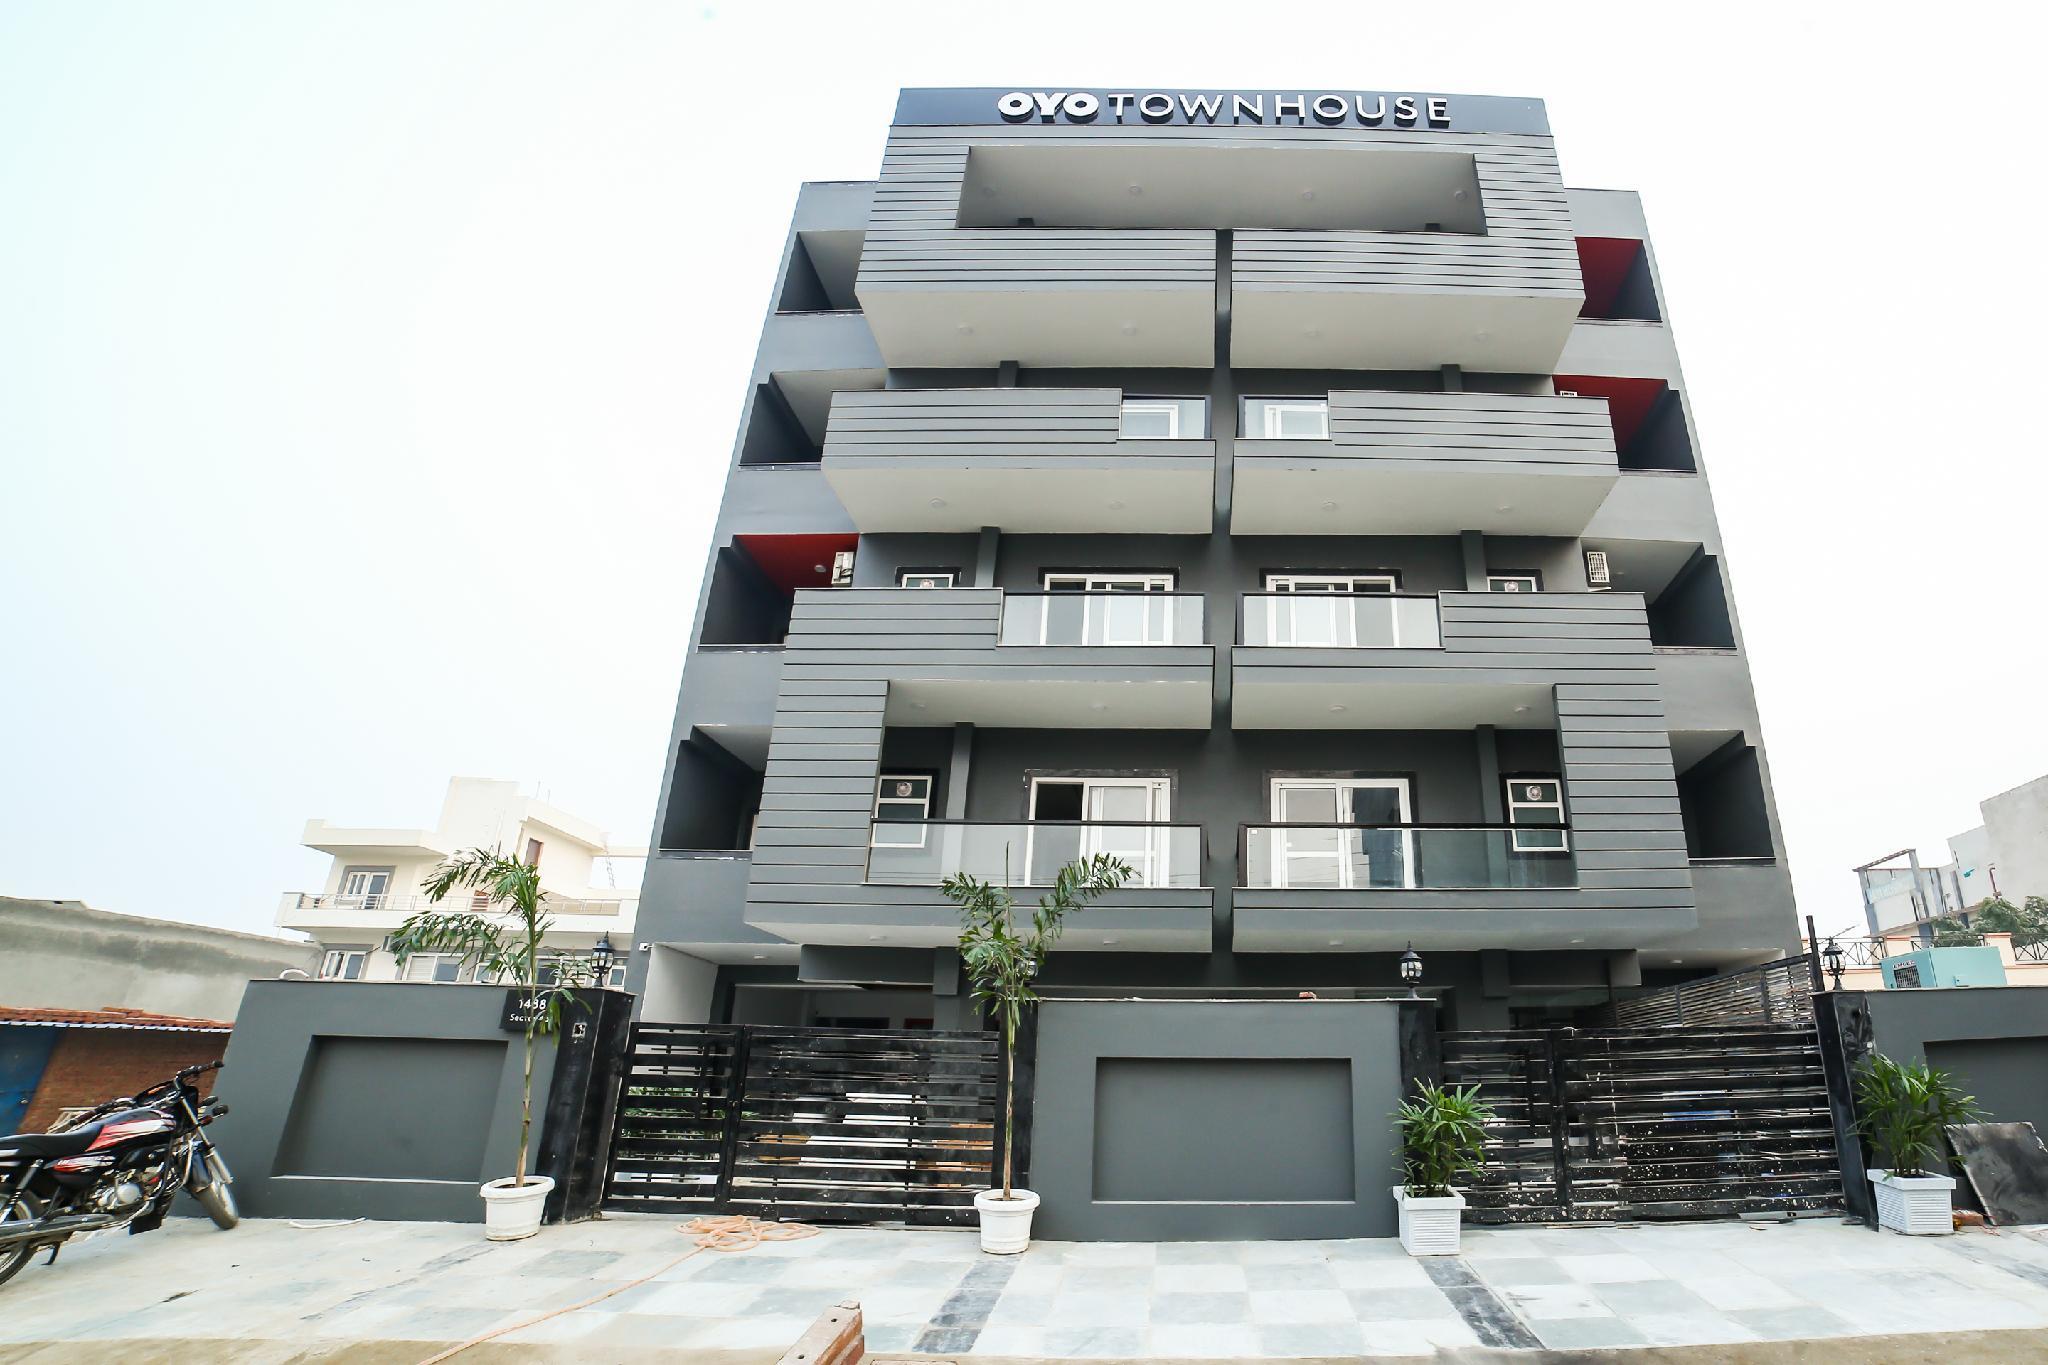 OYO Townhouse 221 Sec 46 Gurgaon